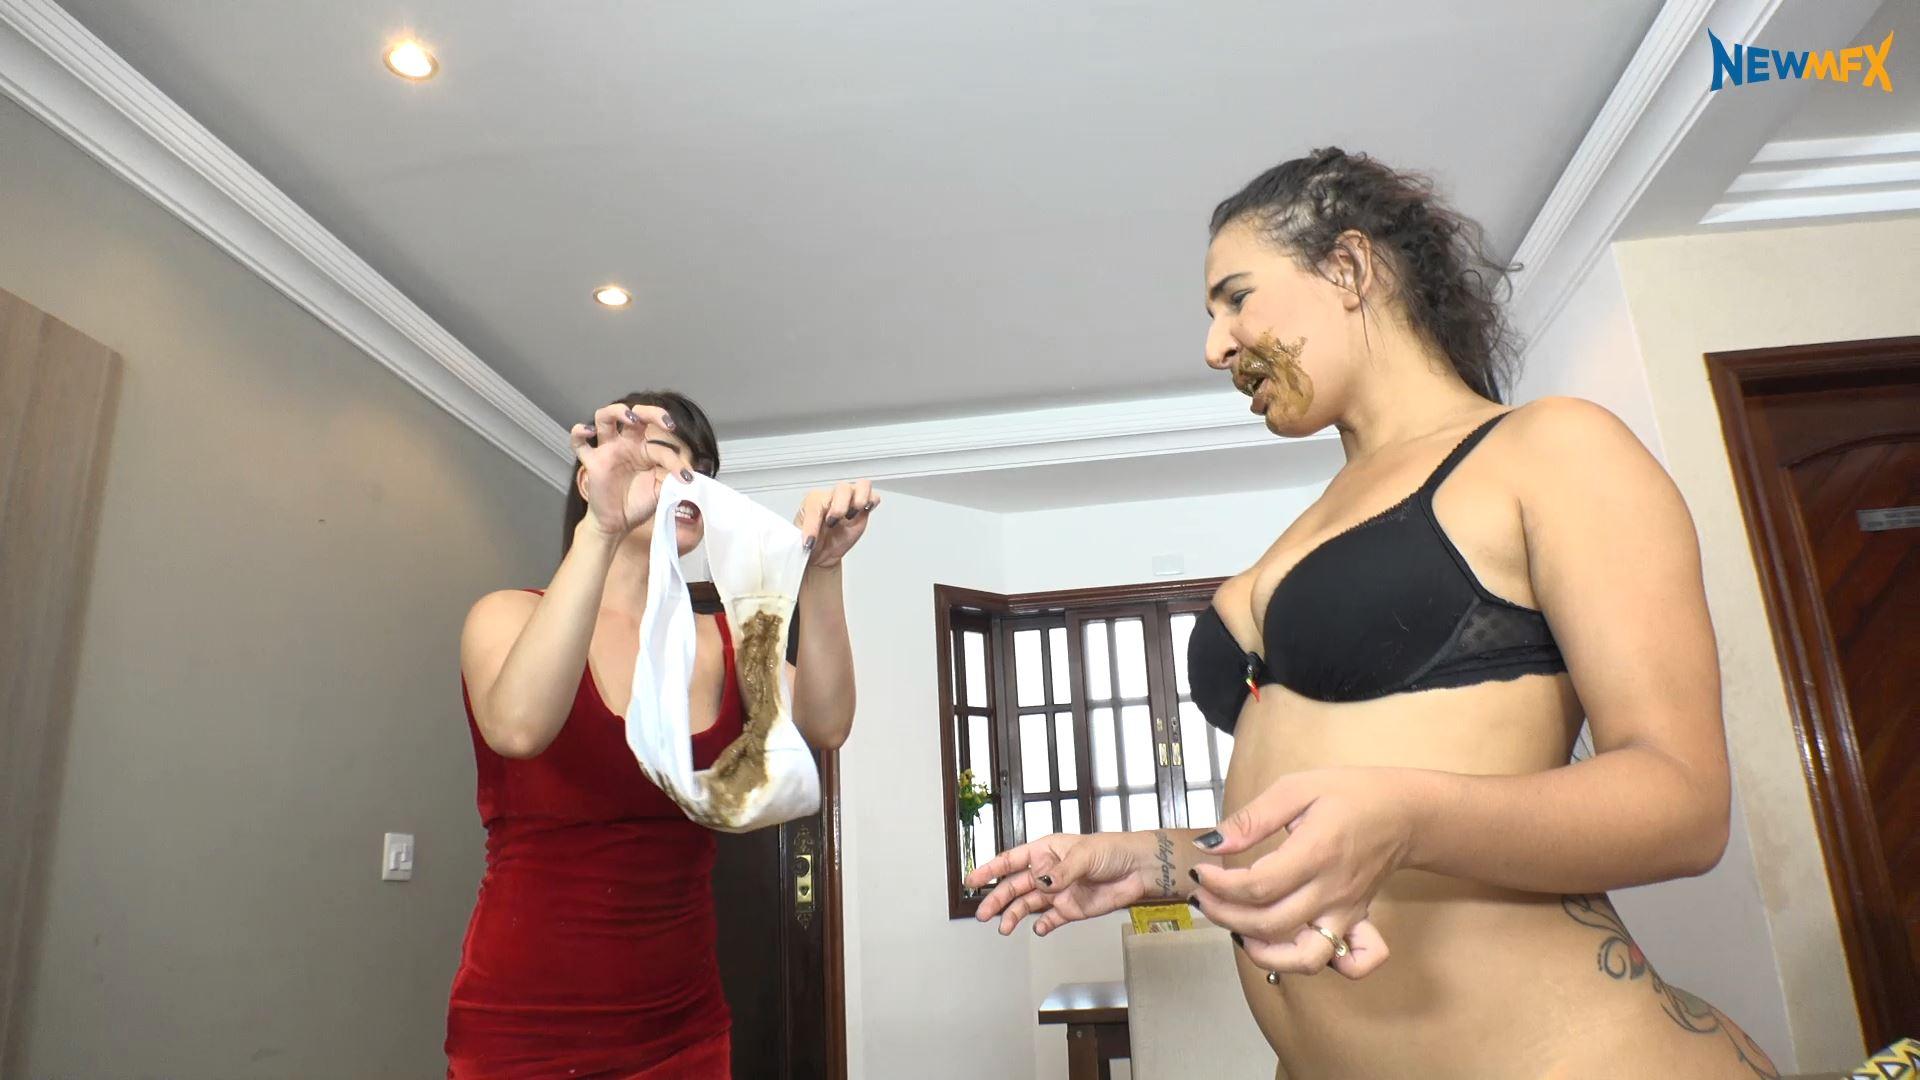 [NEW SCAT IN BRAZIL / NEWMFX] SHITTING ON WHITE PANTIES. Featuring: Milla, Saori Kido, Demmi [FULL HD][1080p][MP4]